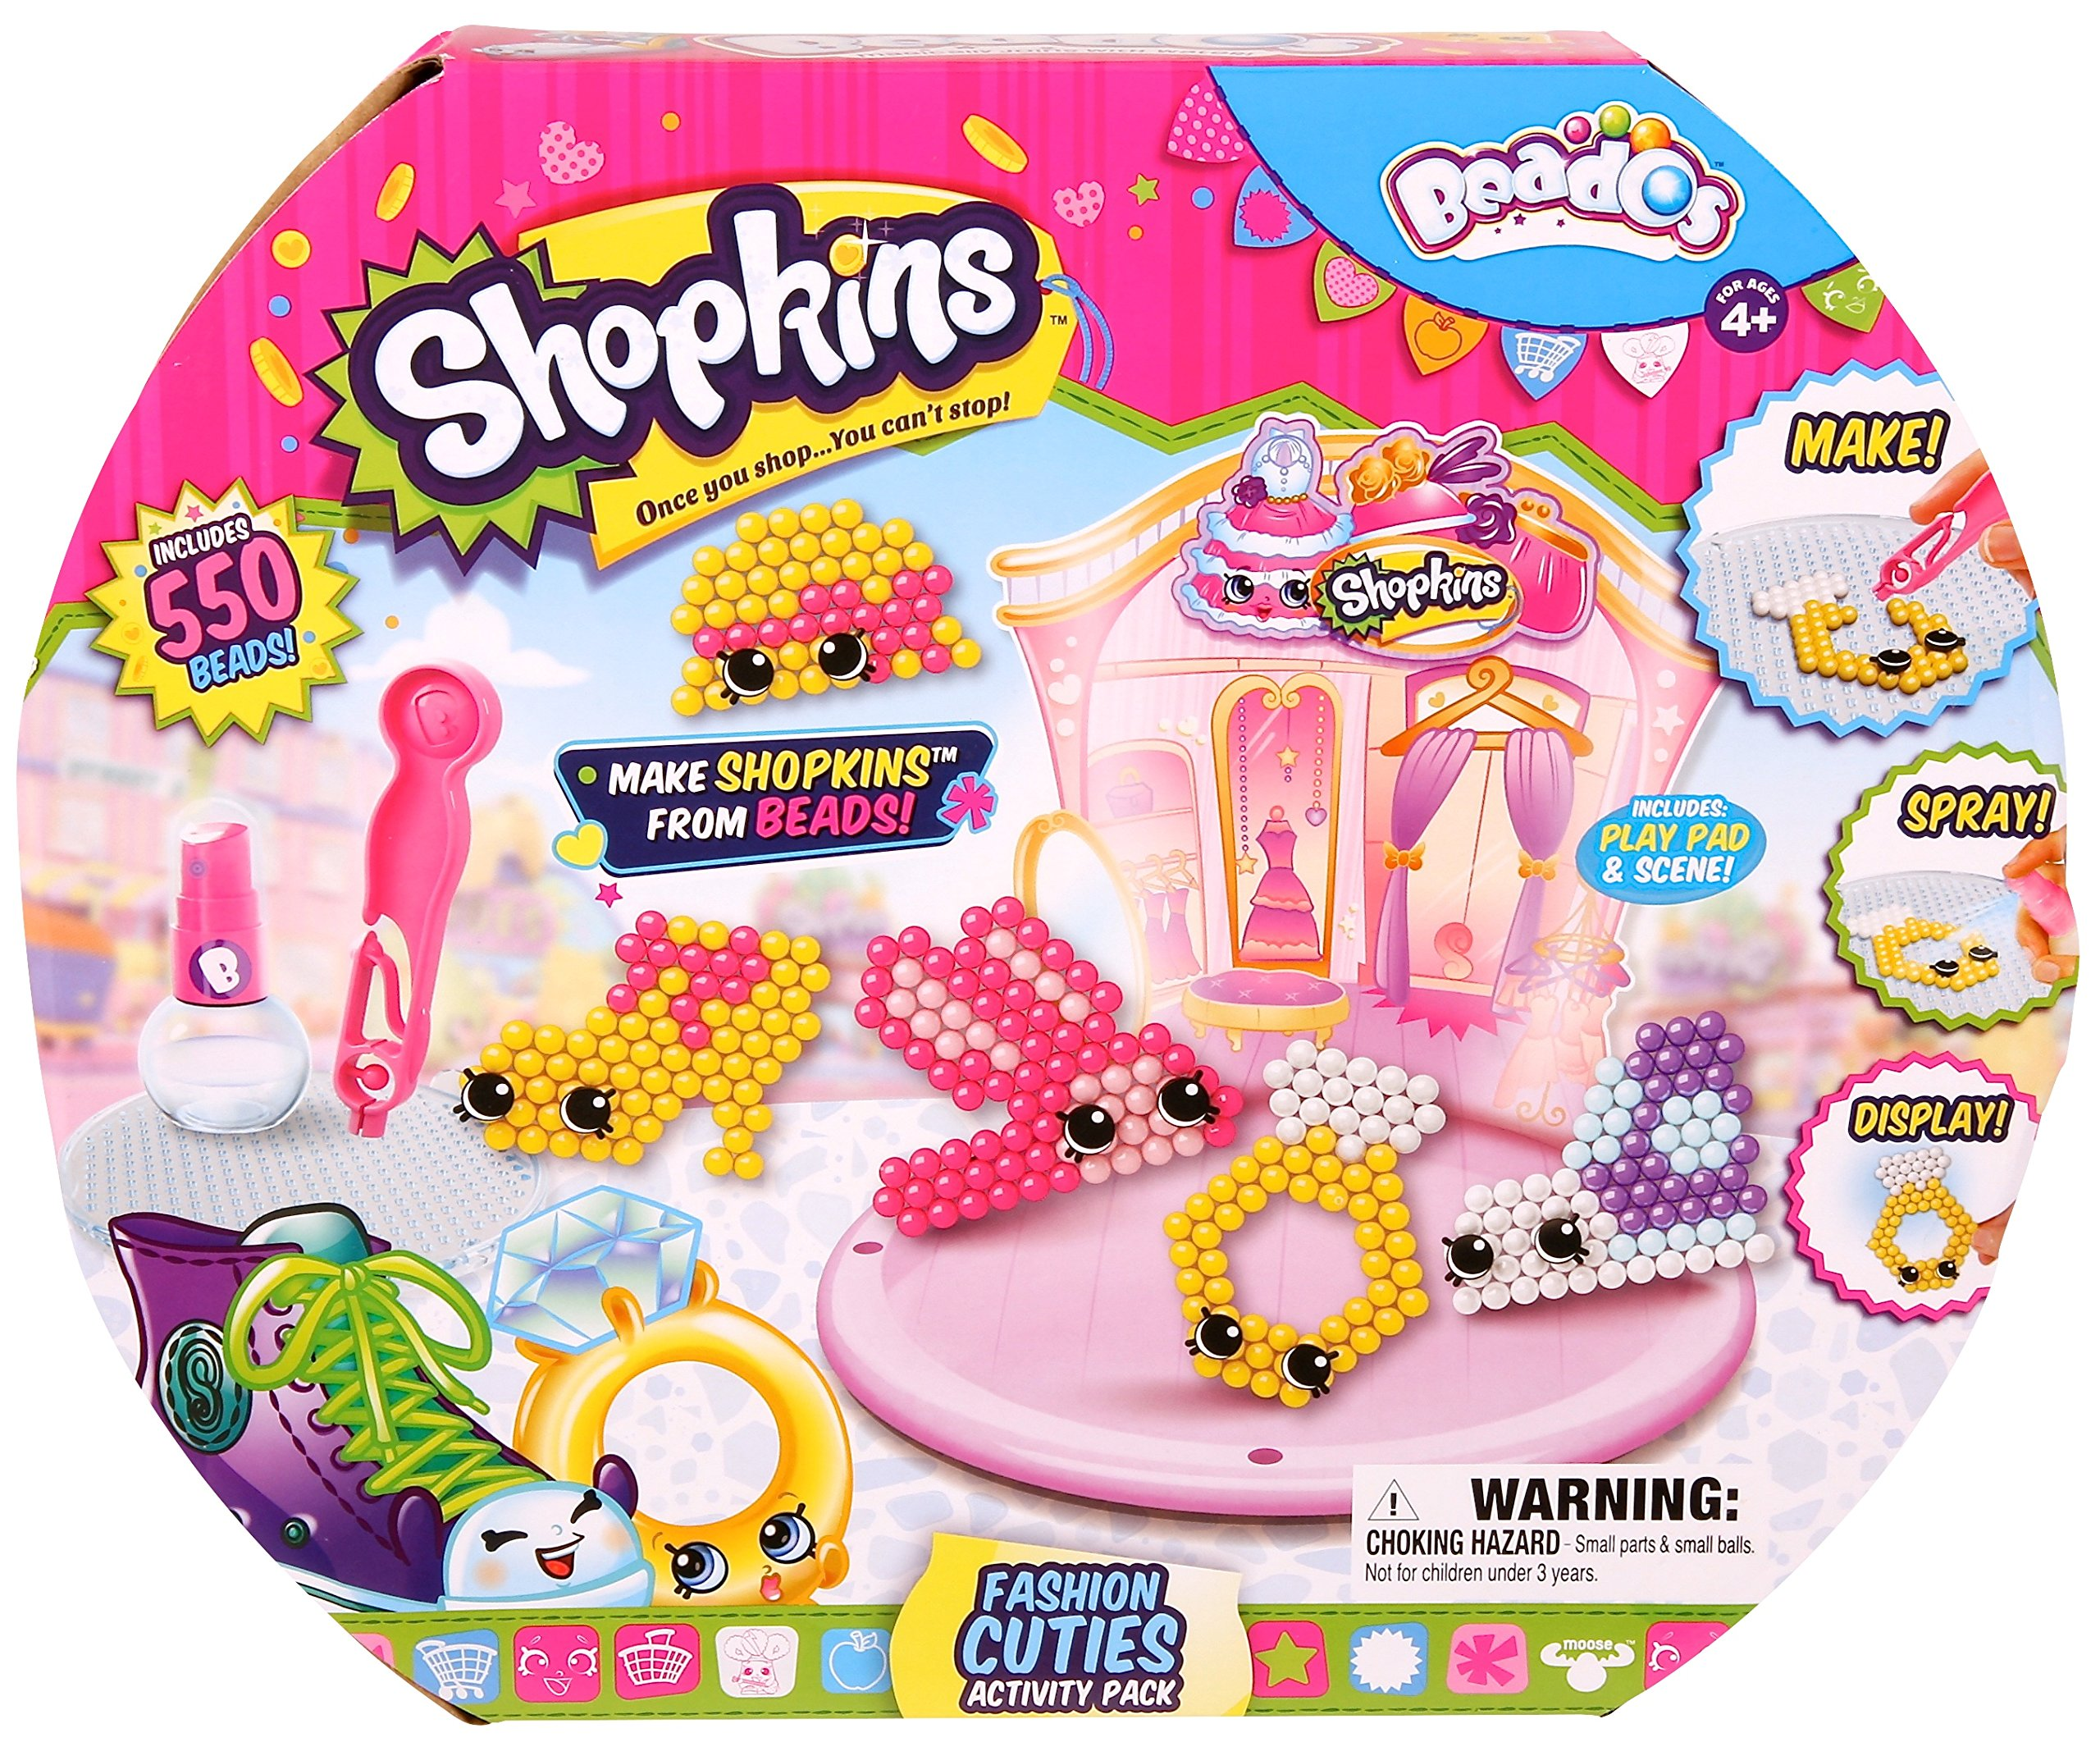 Girl Beados Toys : Beados shopkins fashion cuties activity pack fun kids